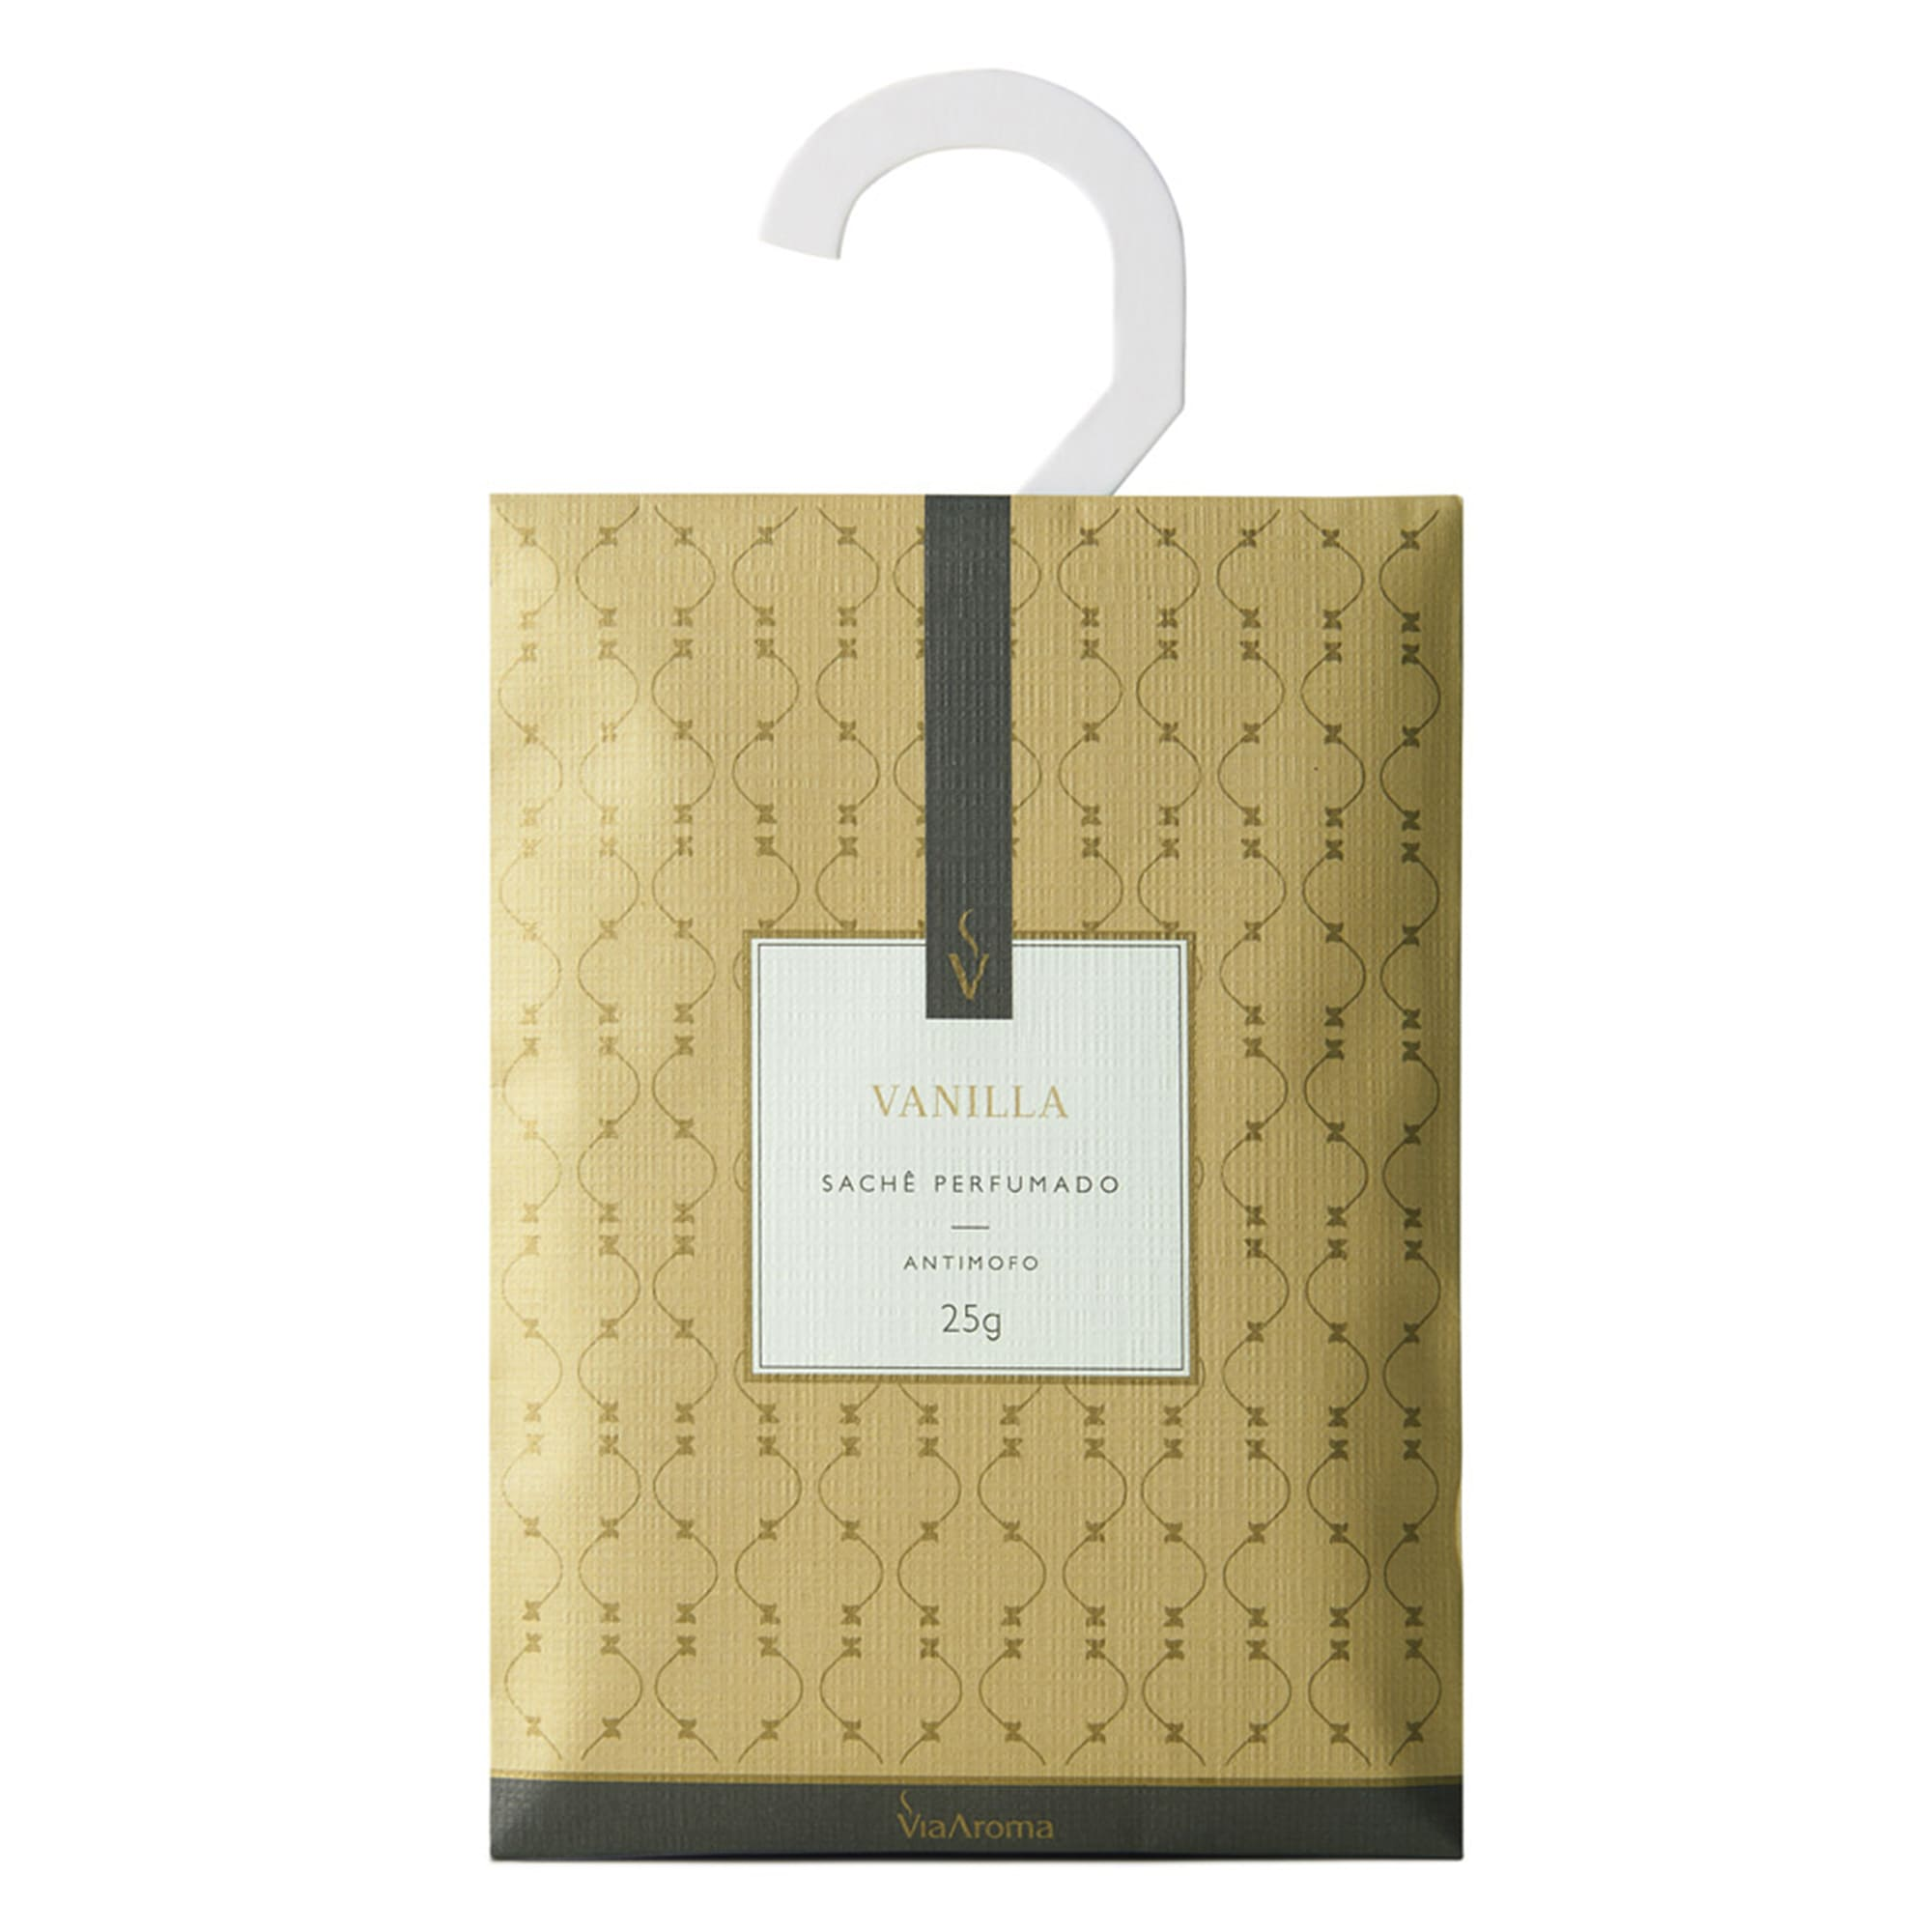 Sachê Perfumado 25g - Vanilla